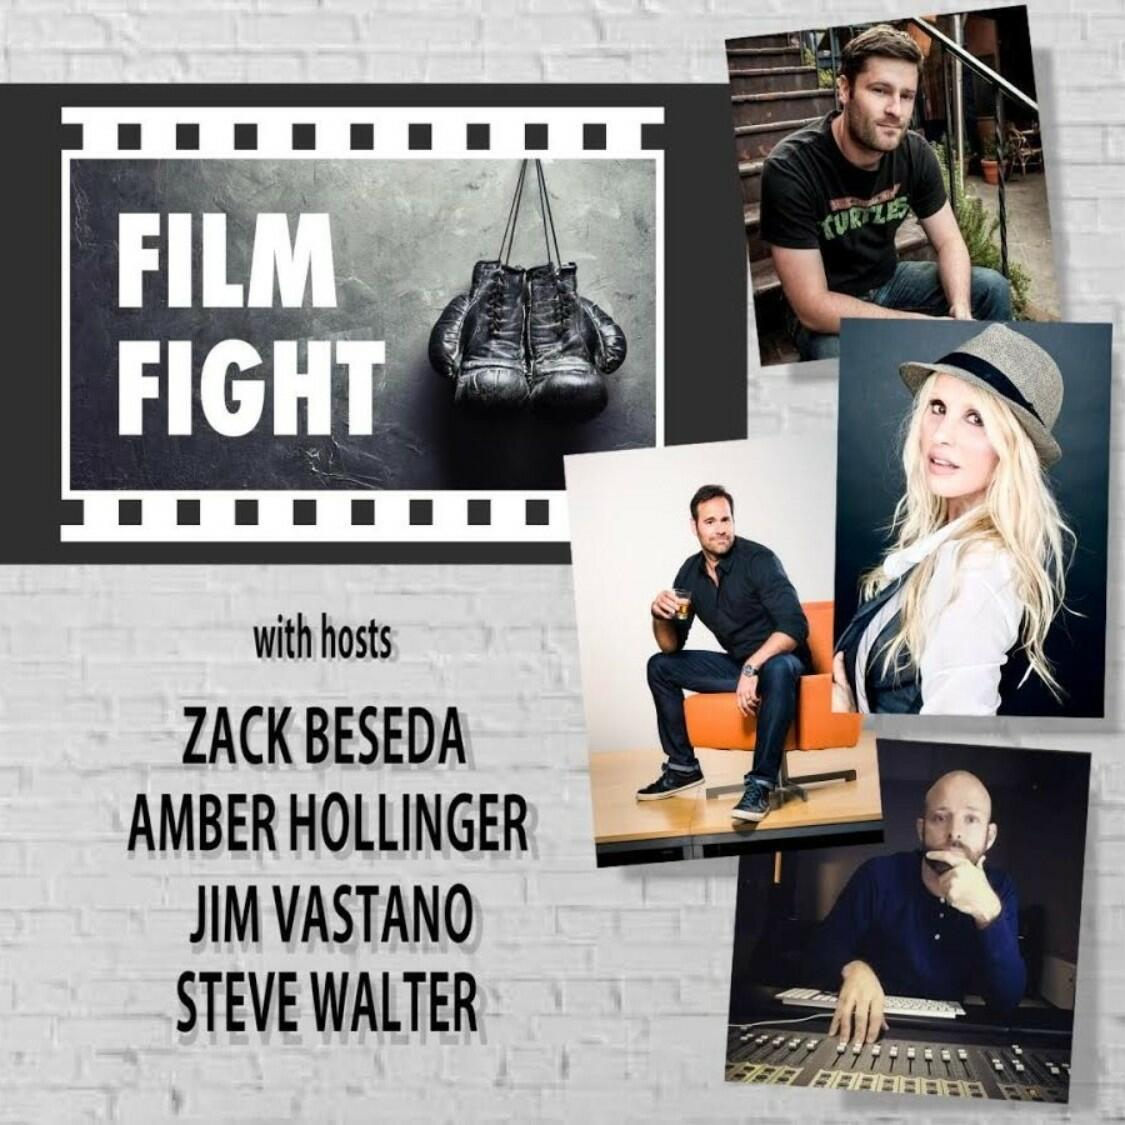 Film Fight